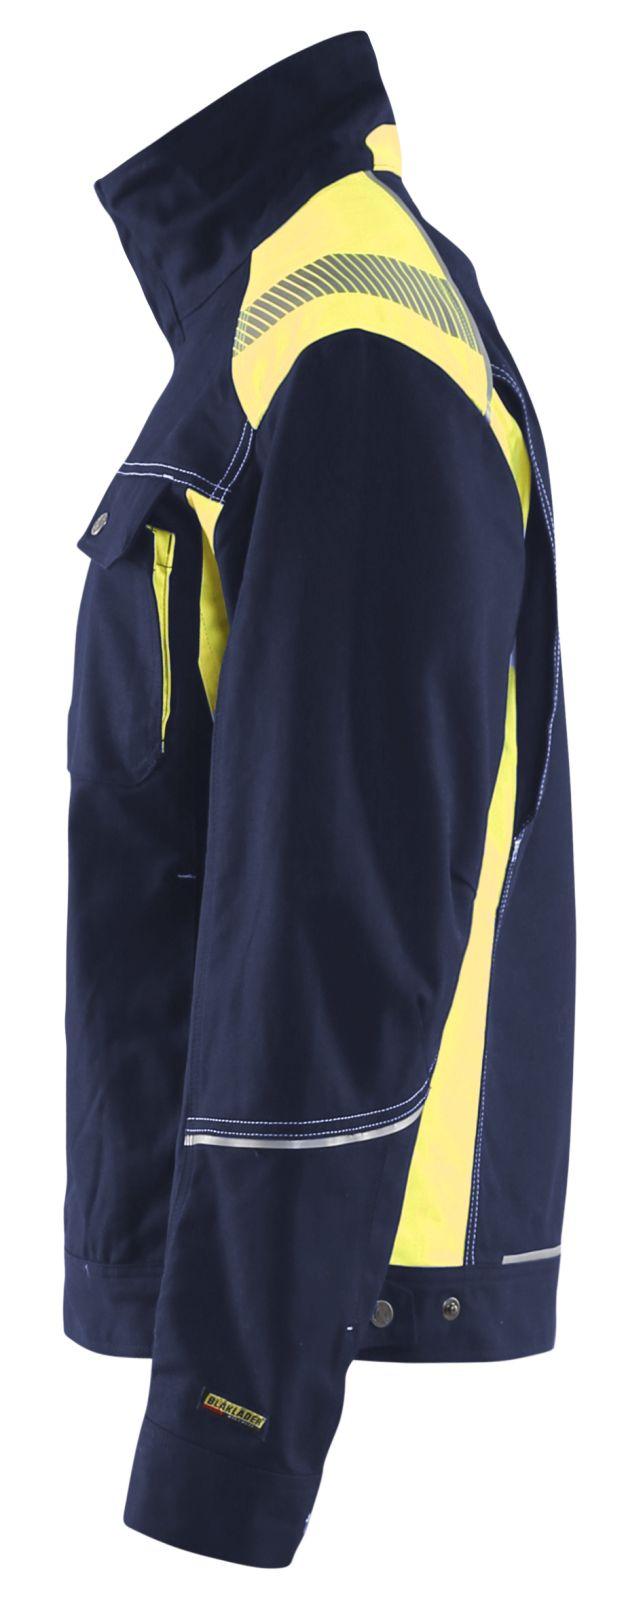 Blaklader Combi-jacks 40951370 marineblauw-geel(8833)